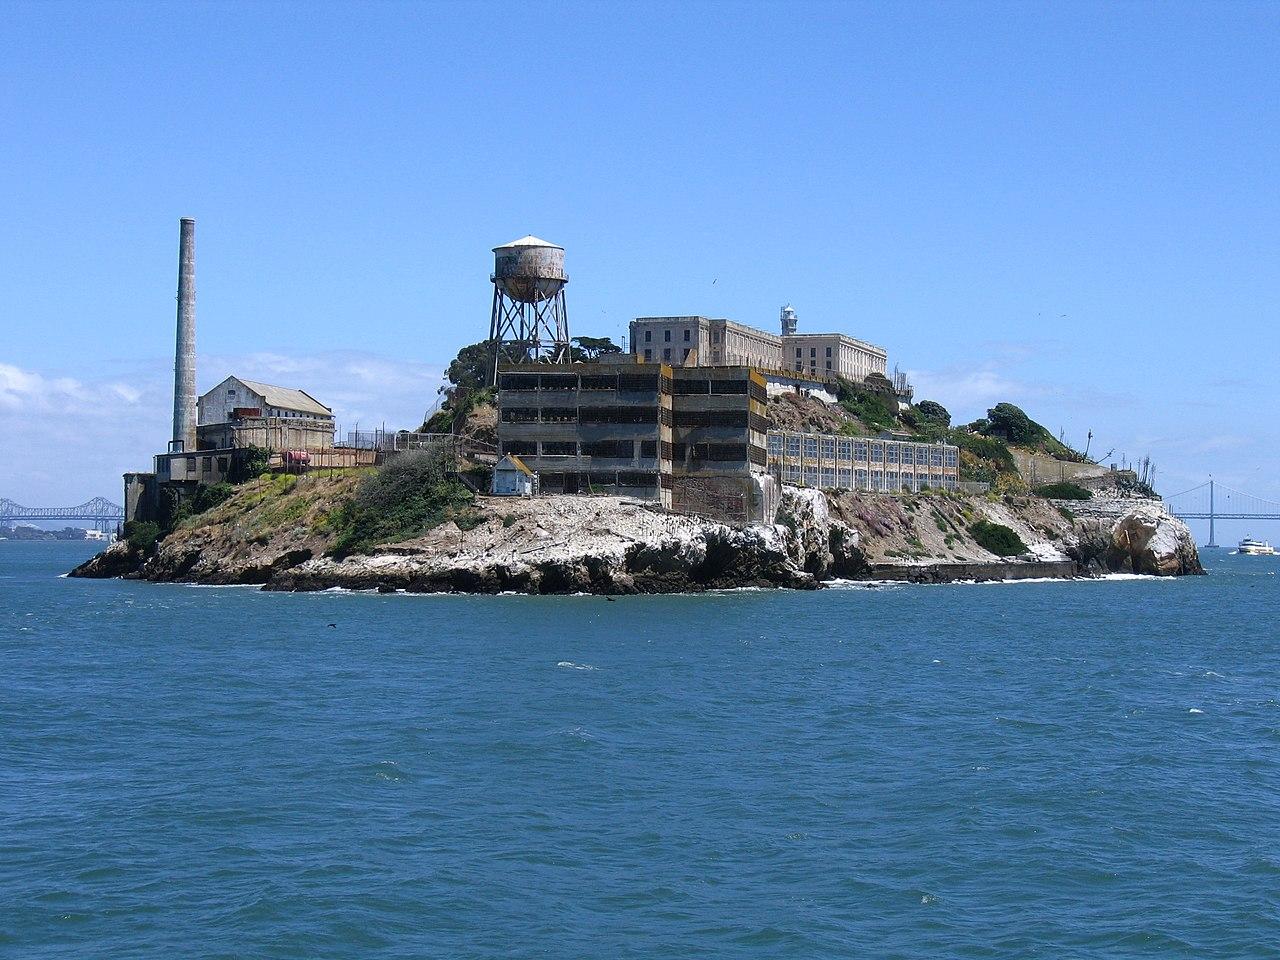 http://upload.wikimedia.org/wikipedia/commons/thumb/6/67/Alcatraz_Island.jpg/1280px-Alcatraz_Island.jpg